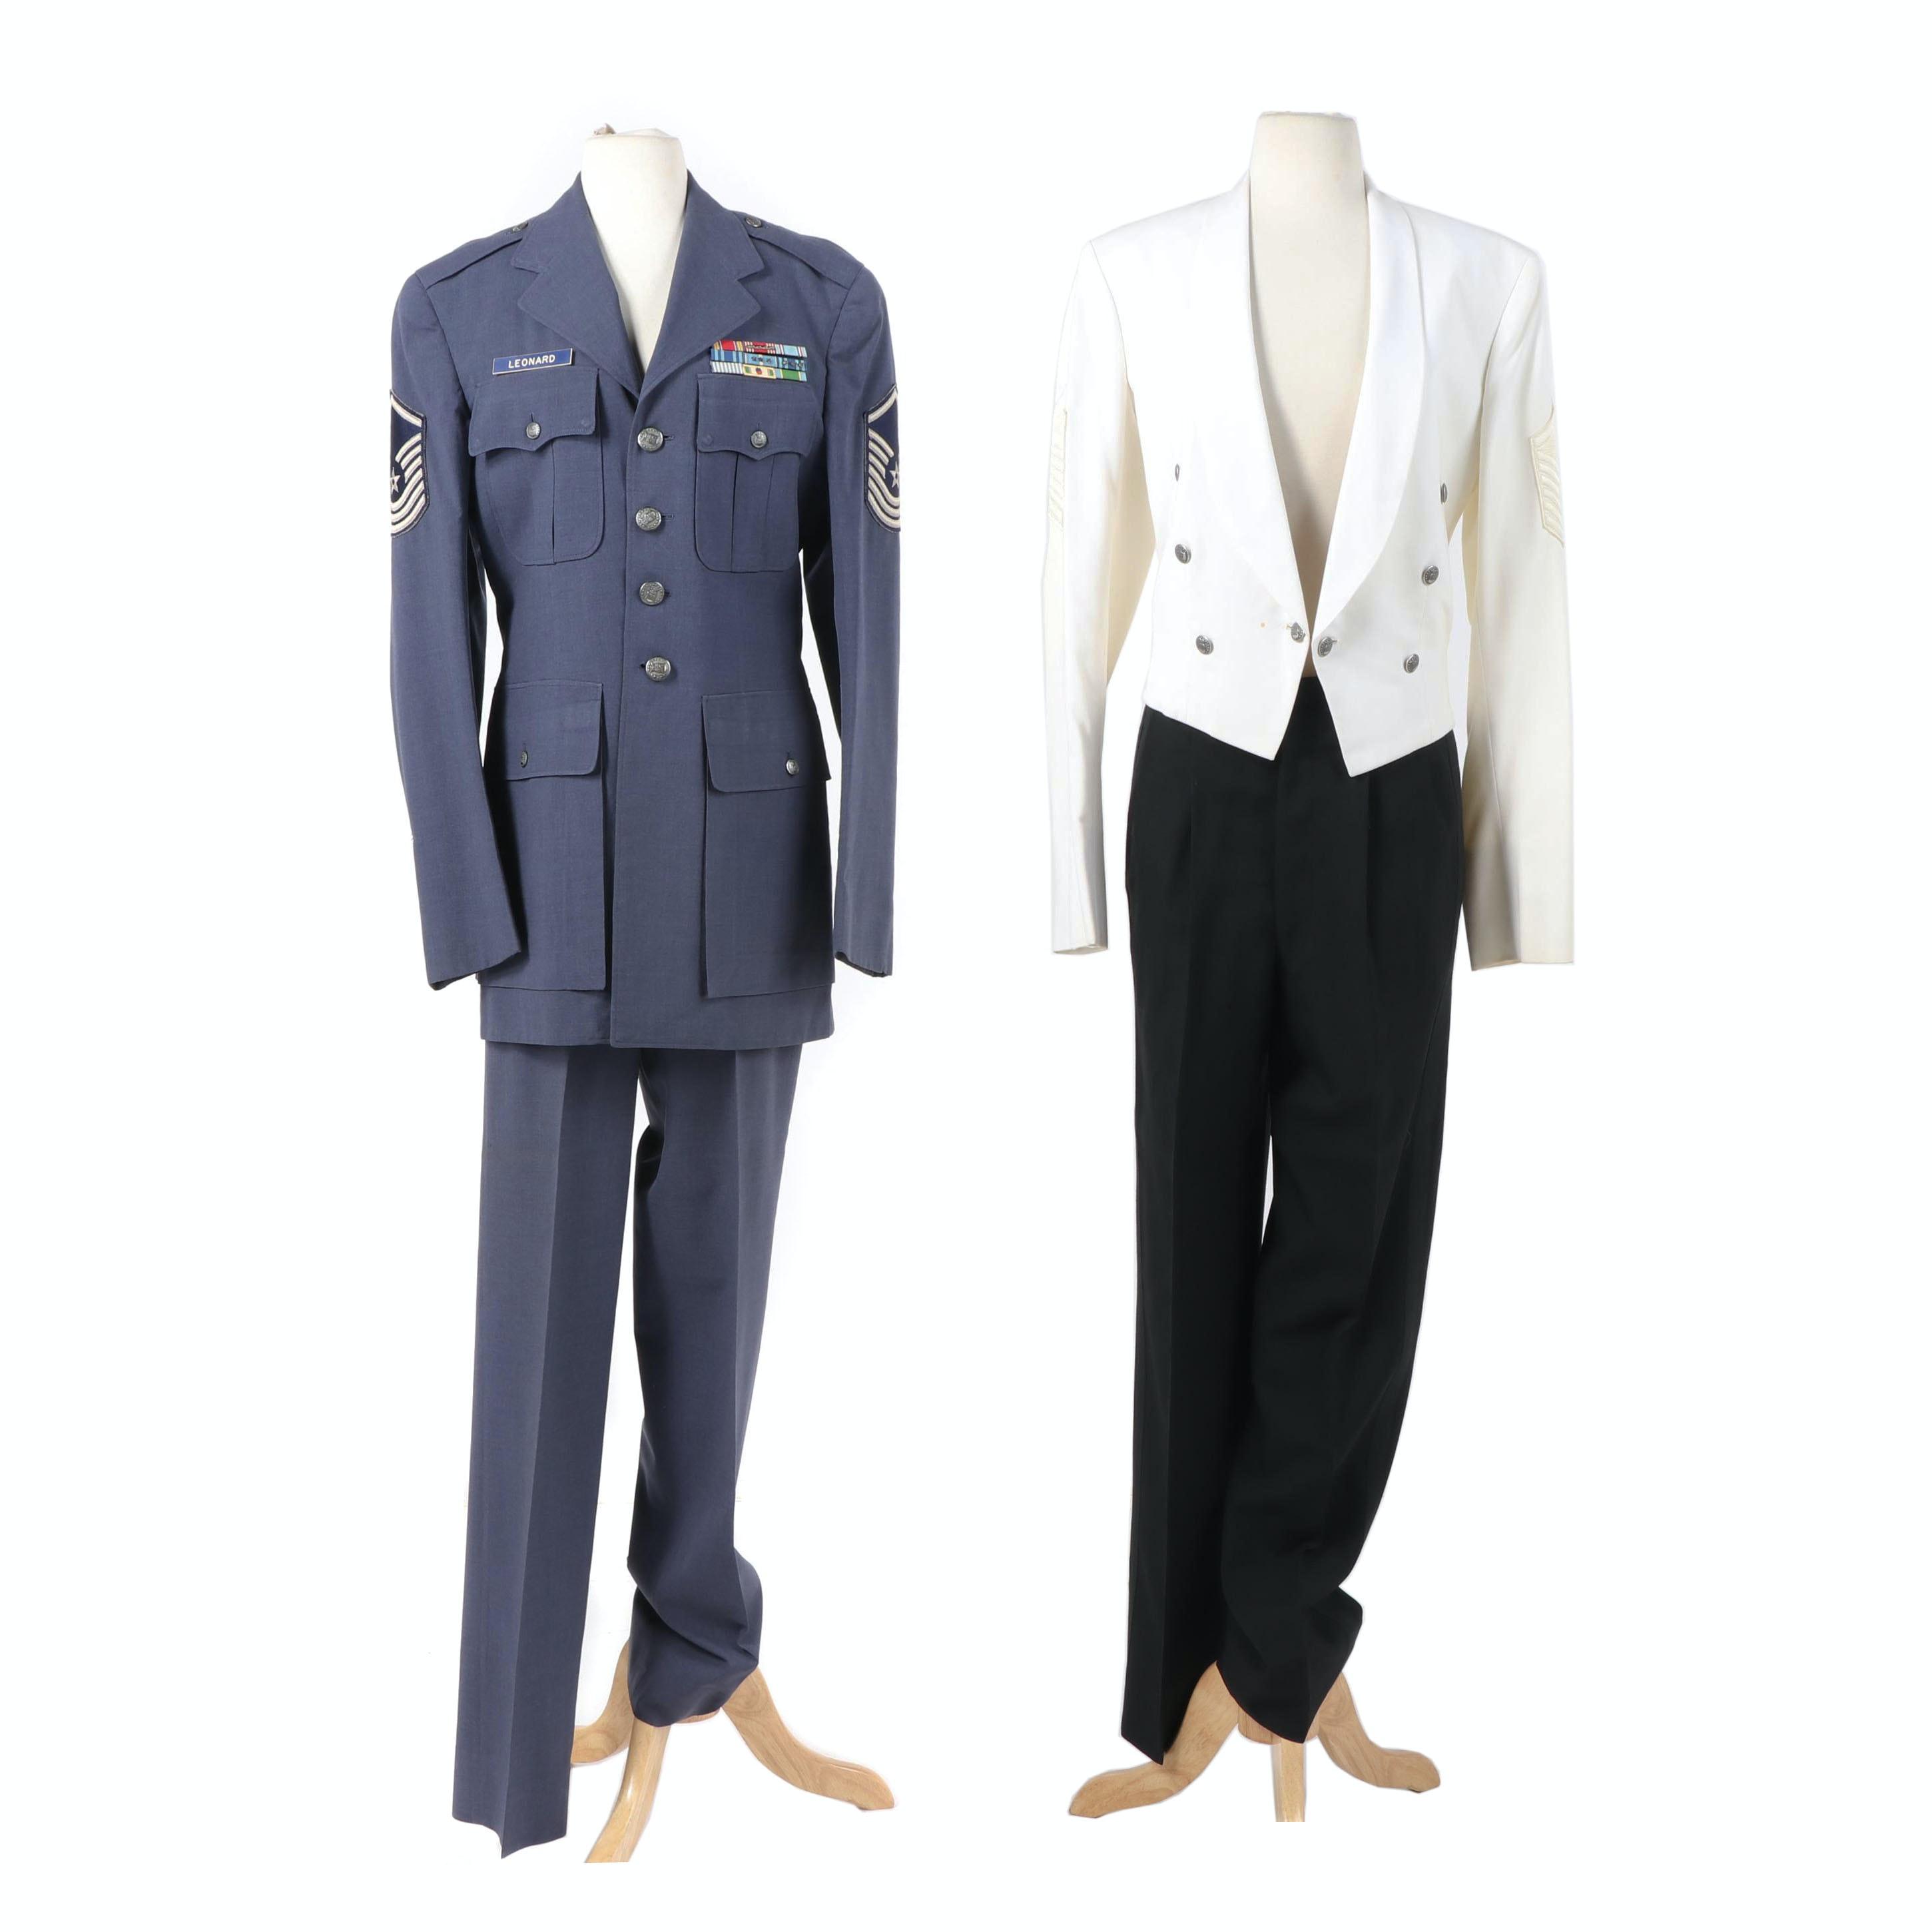 Vintage Air Force Master Sergeant Dress Uniform and Formal Dinner Uniform